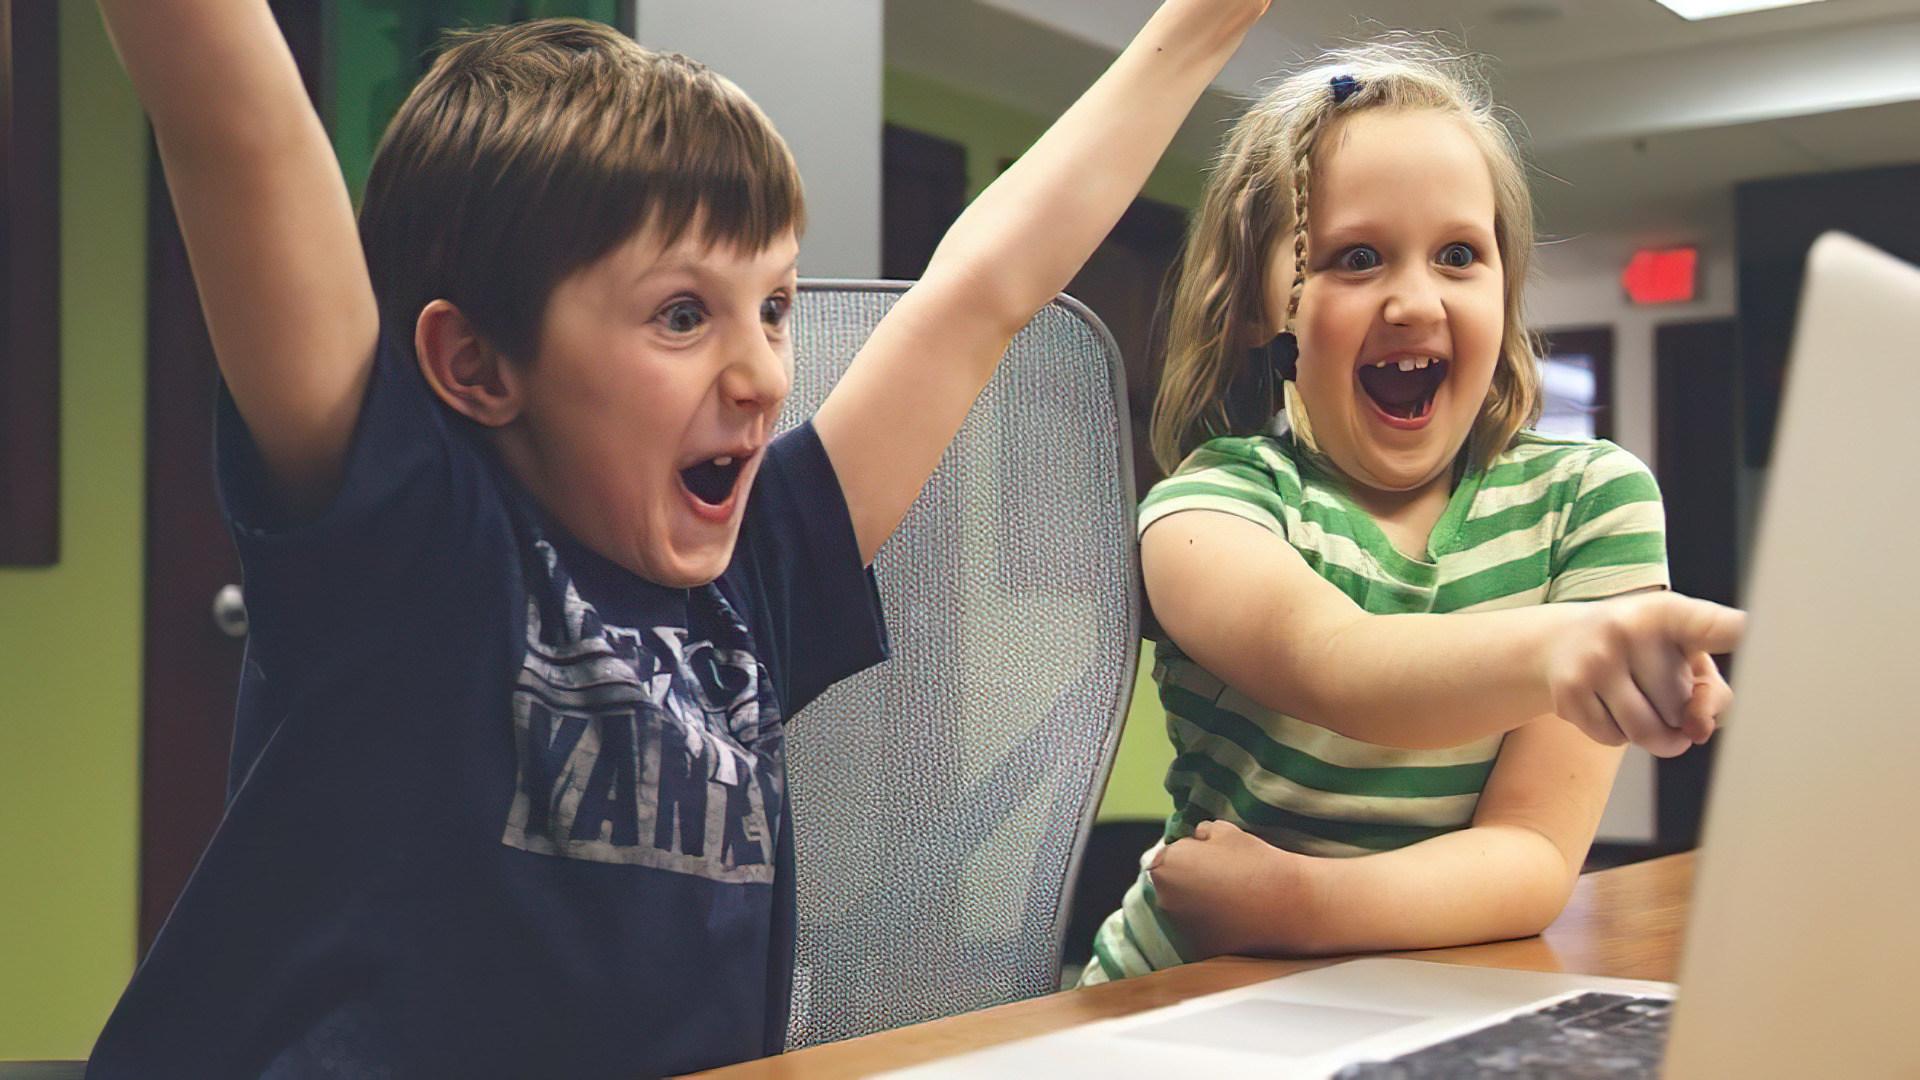 Computer, Kinder, Schule, Schüler, Jubel